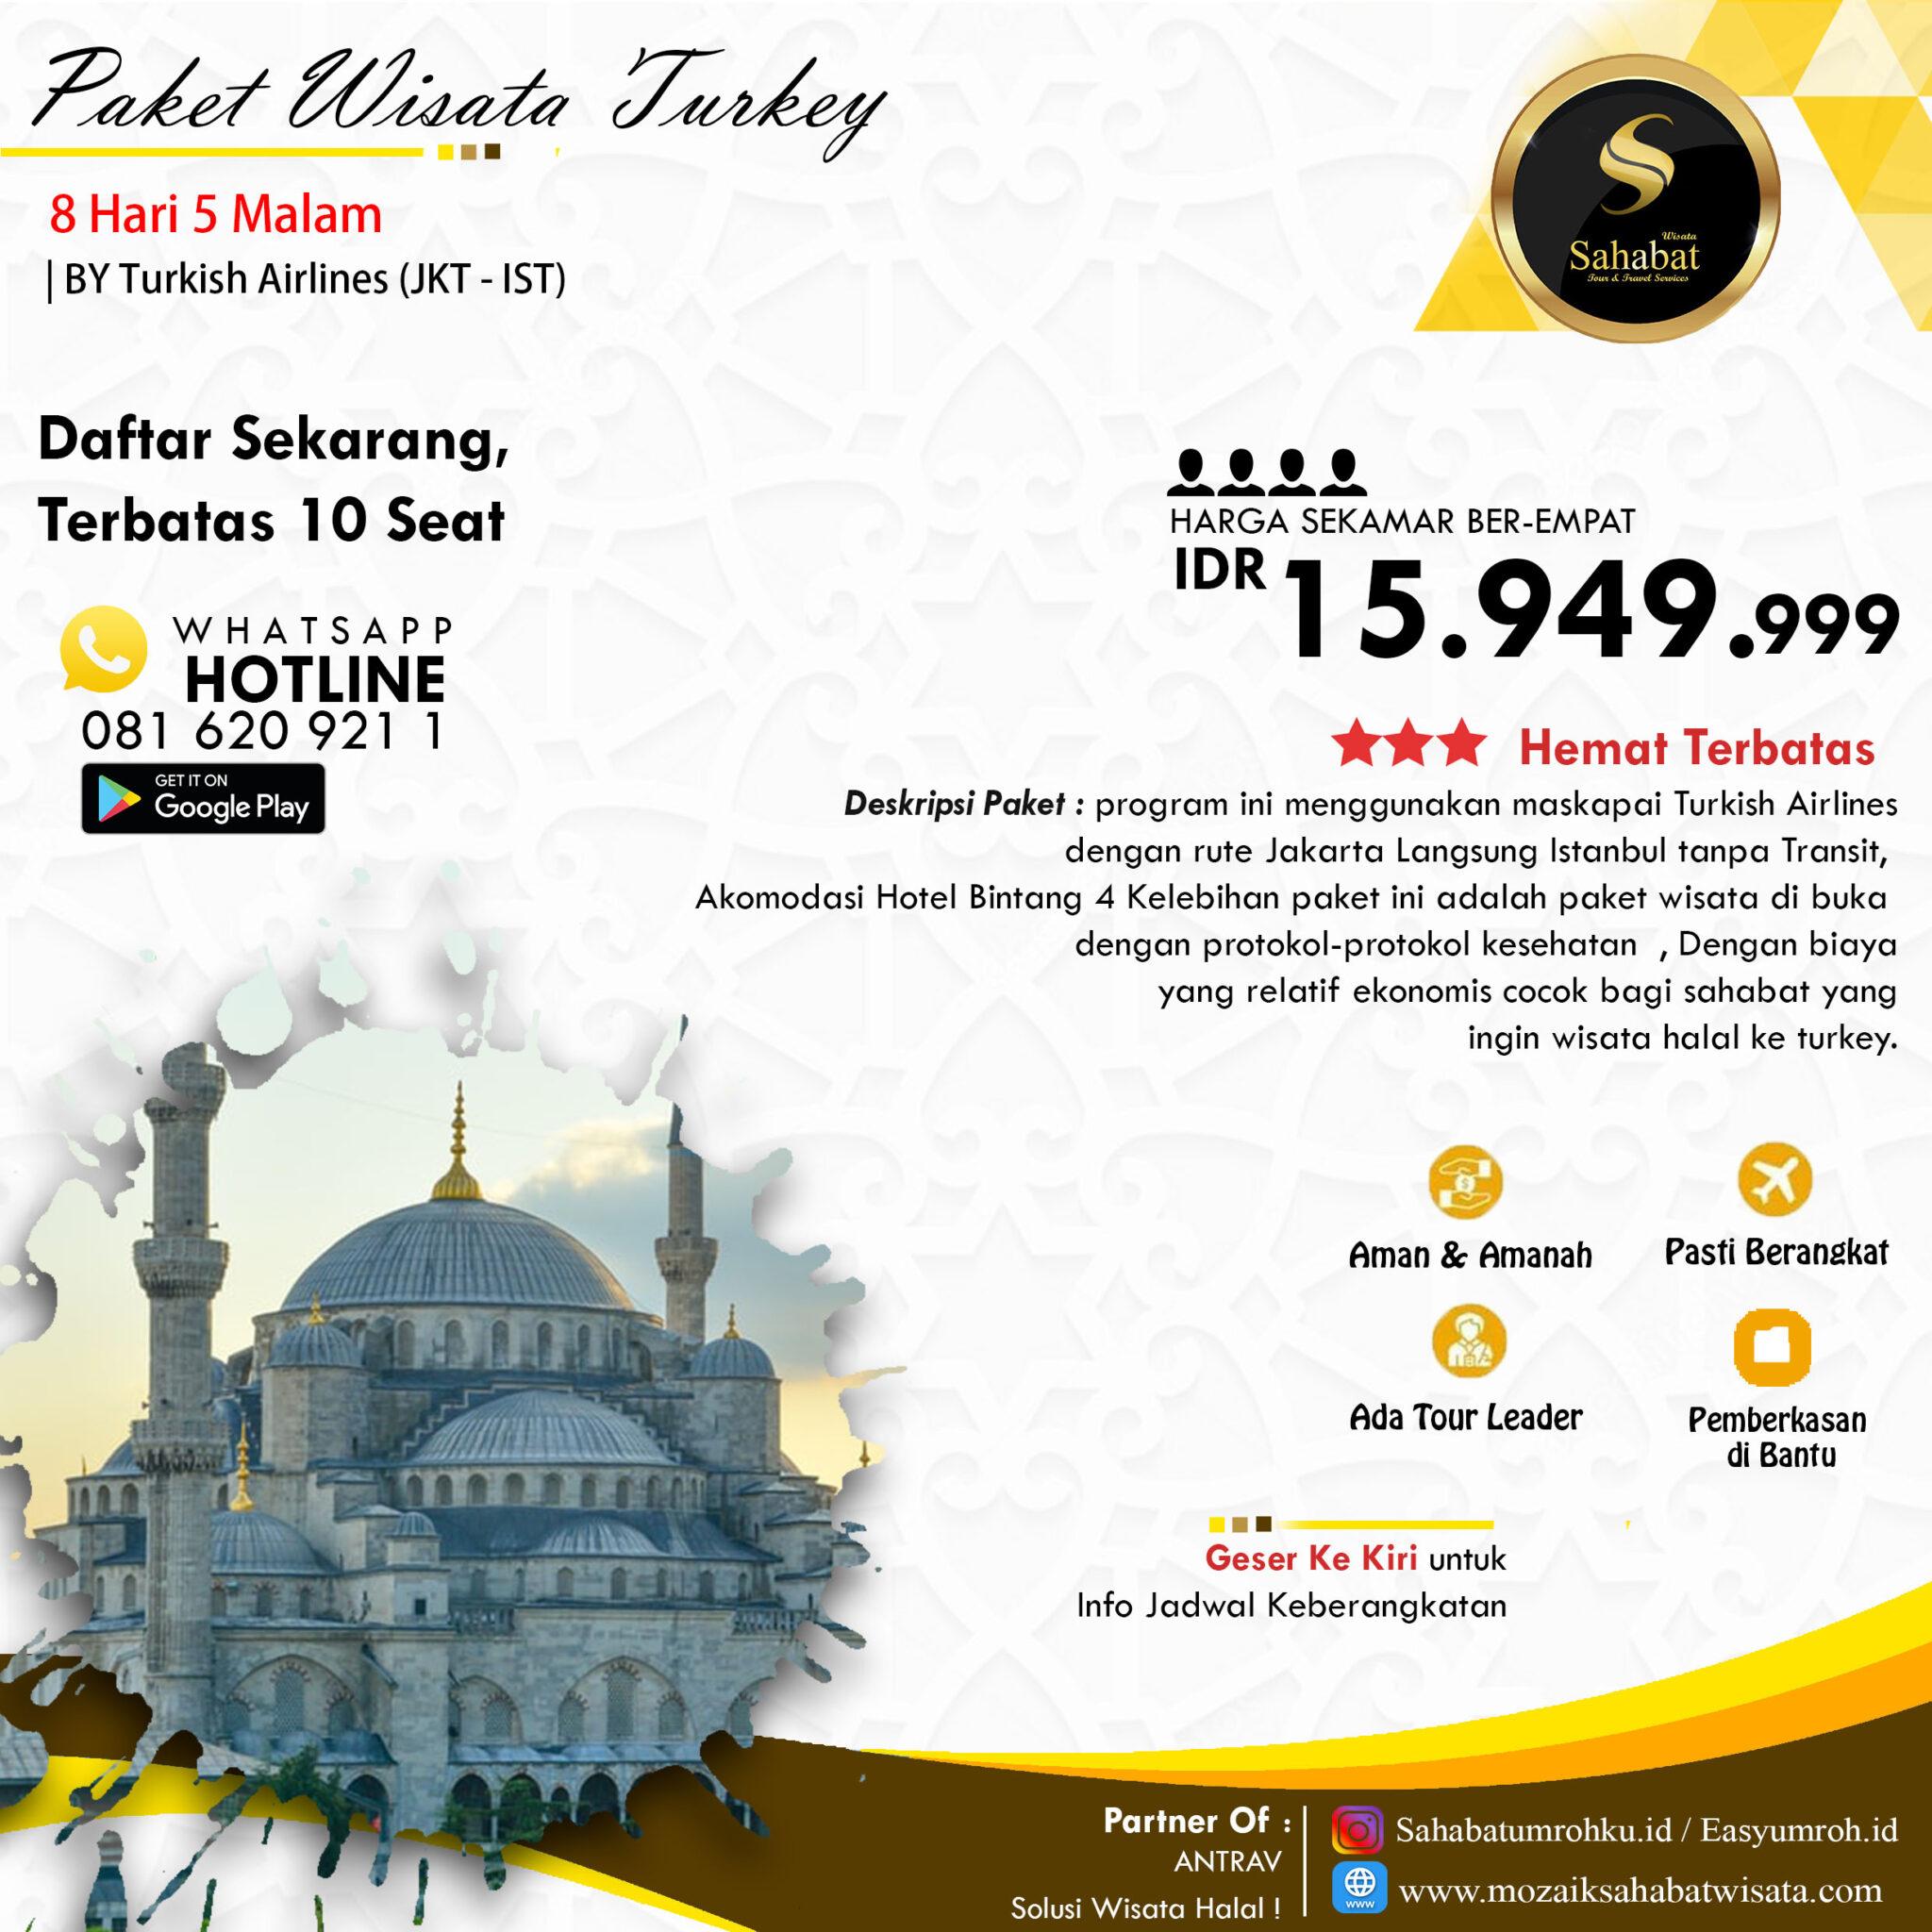 Paket Wisata Halal Turkey 8 Hari 5 Malam Mozaik Sahabat Wisata Travel Umroh Murah Start Surabaya Paket Umroh Hemat Umroh Surabaya Pesona Sahabat Wisata Mozaik